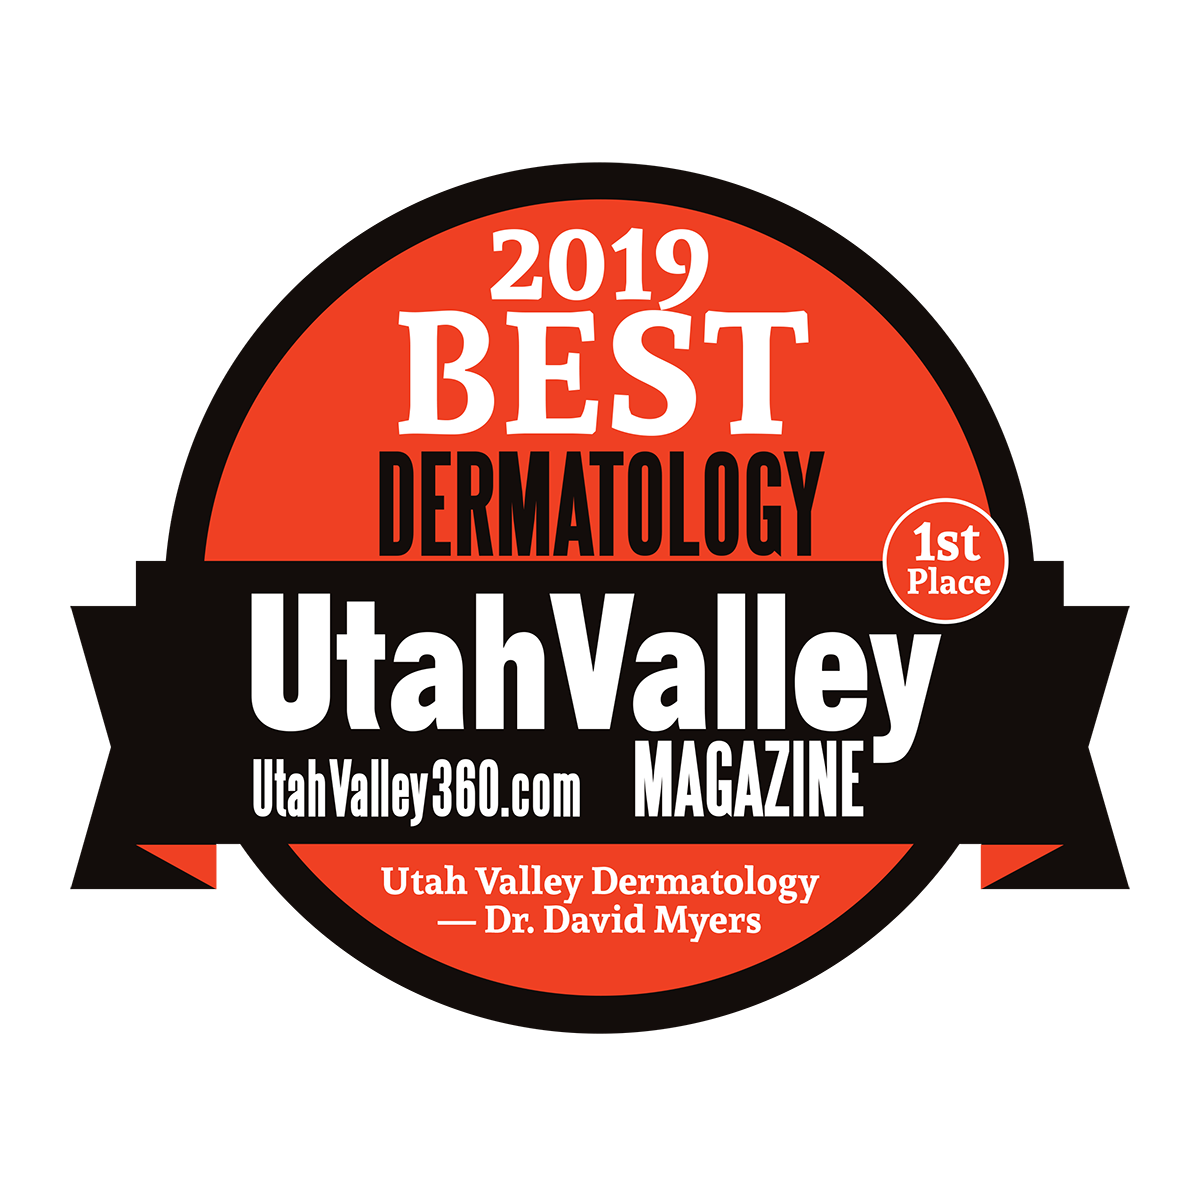 2019 Best Dermatology - Utah Valley Magazine - Uvderm.com